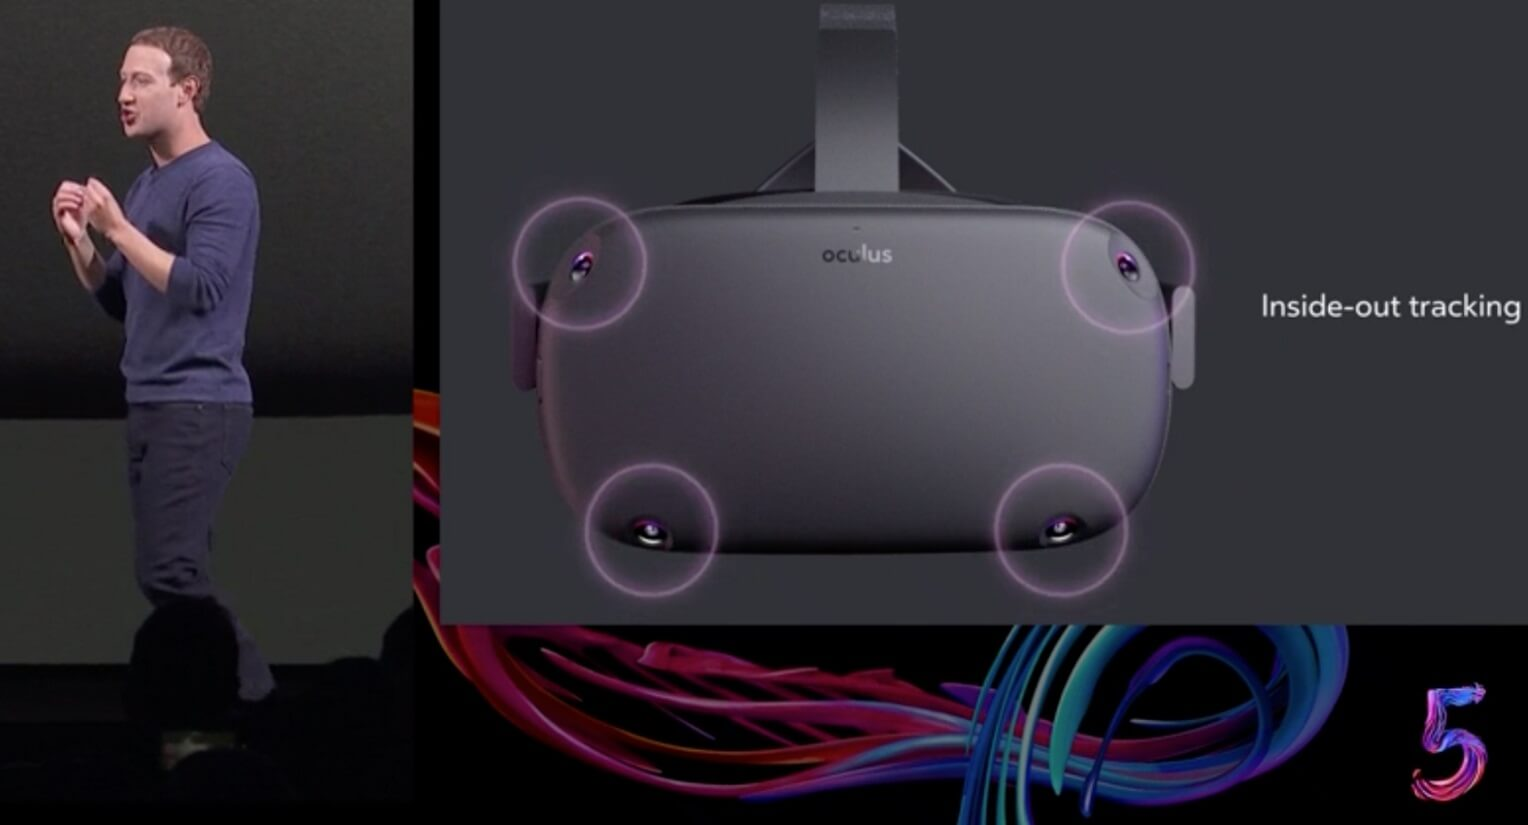 oculus quest announcement